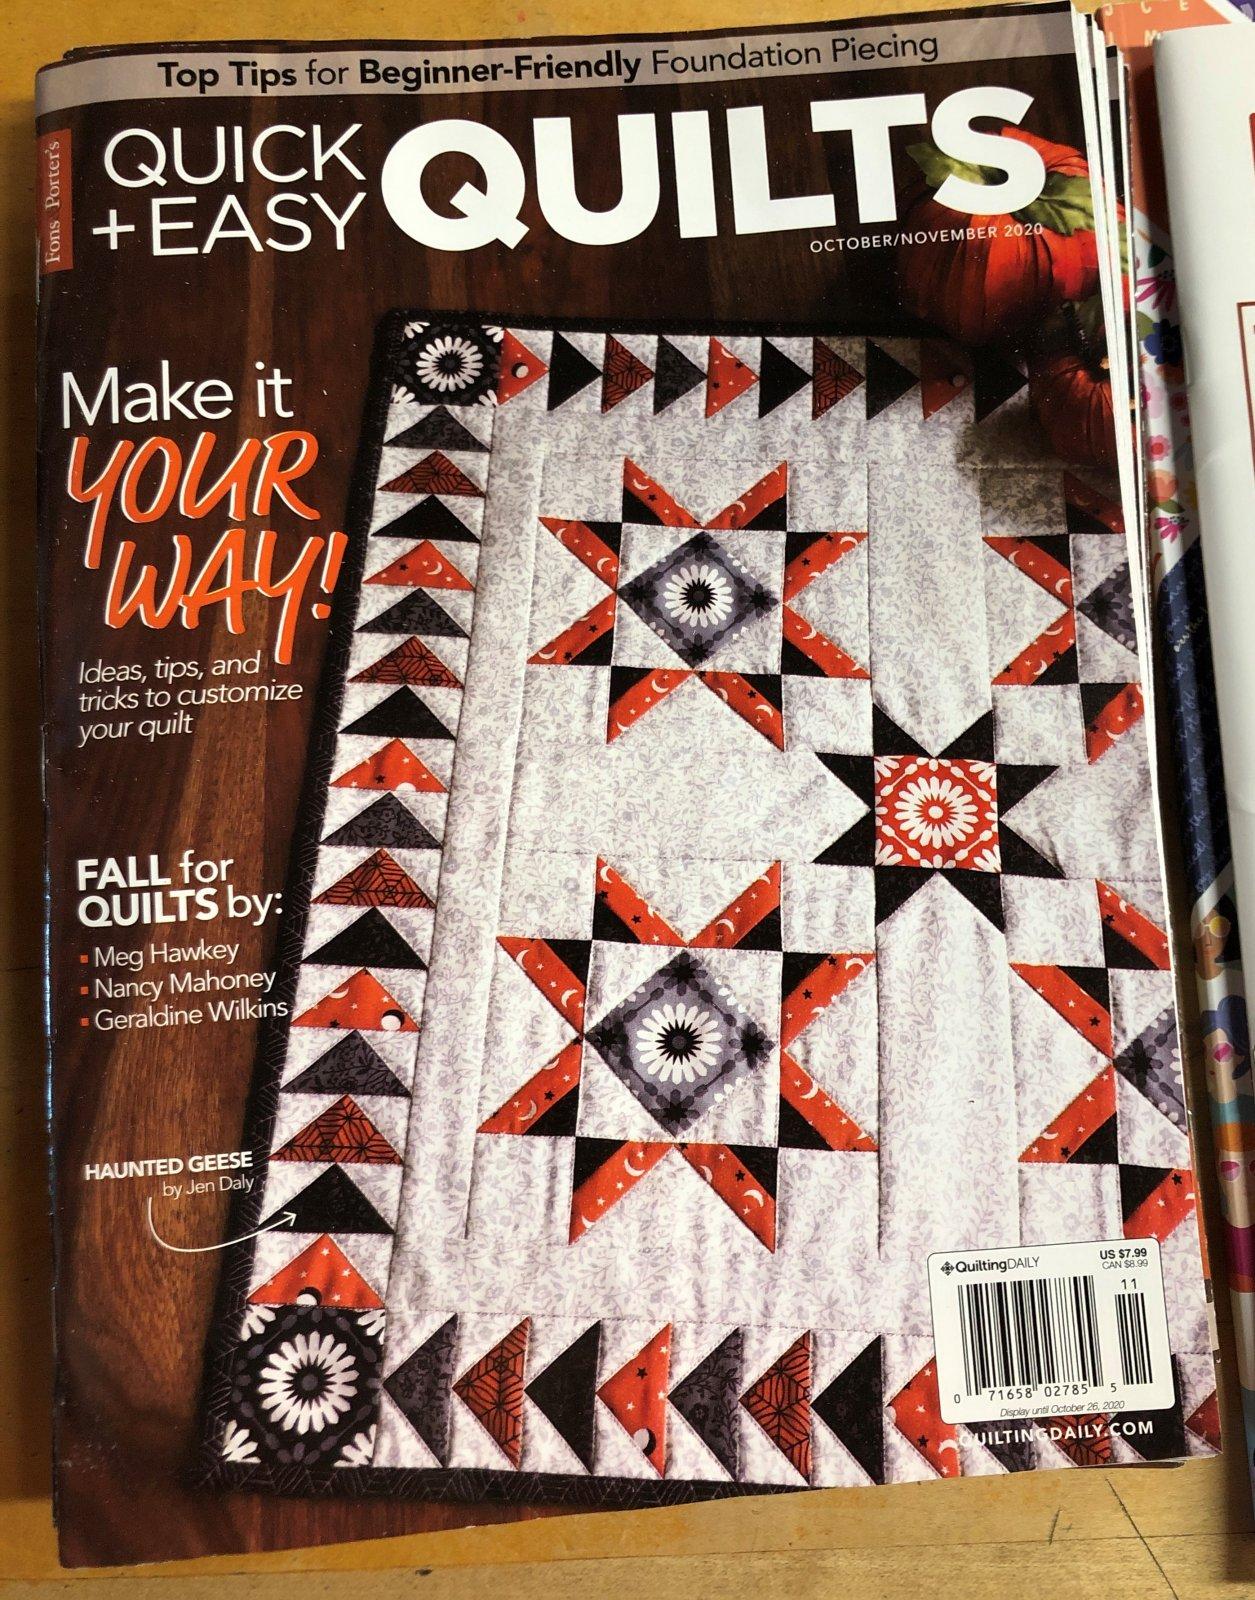 Fons & Porter Quilt & Easy Quilts Magazine - October/November 2020